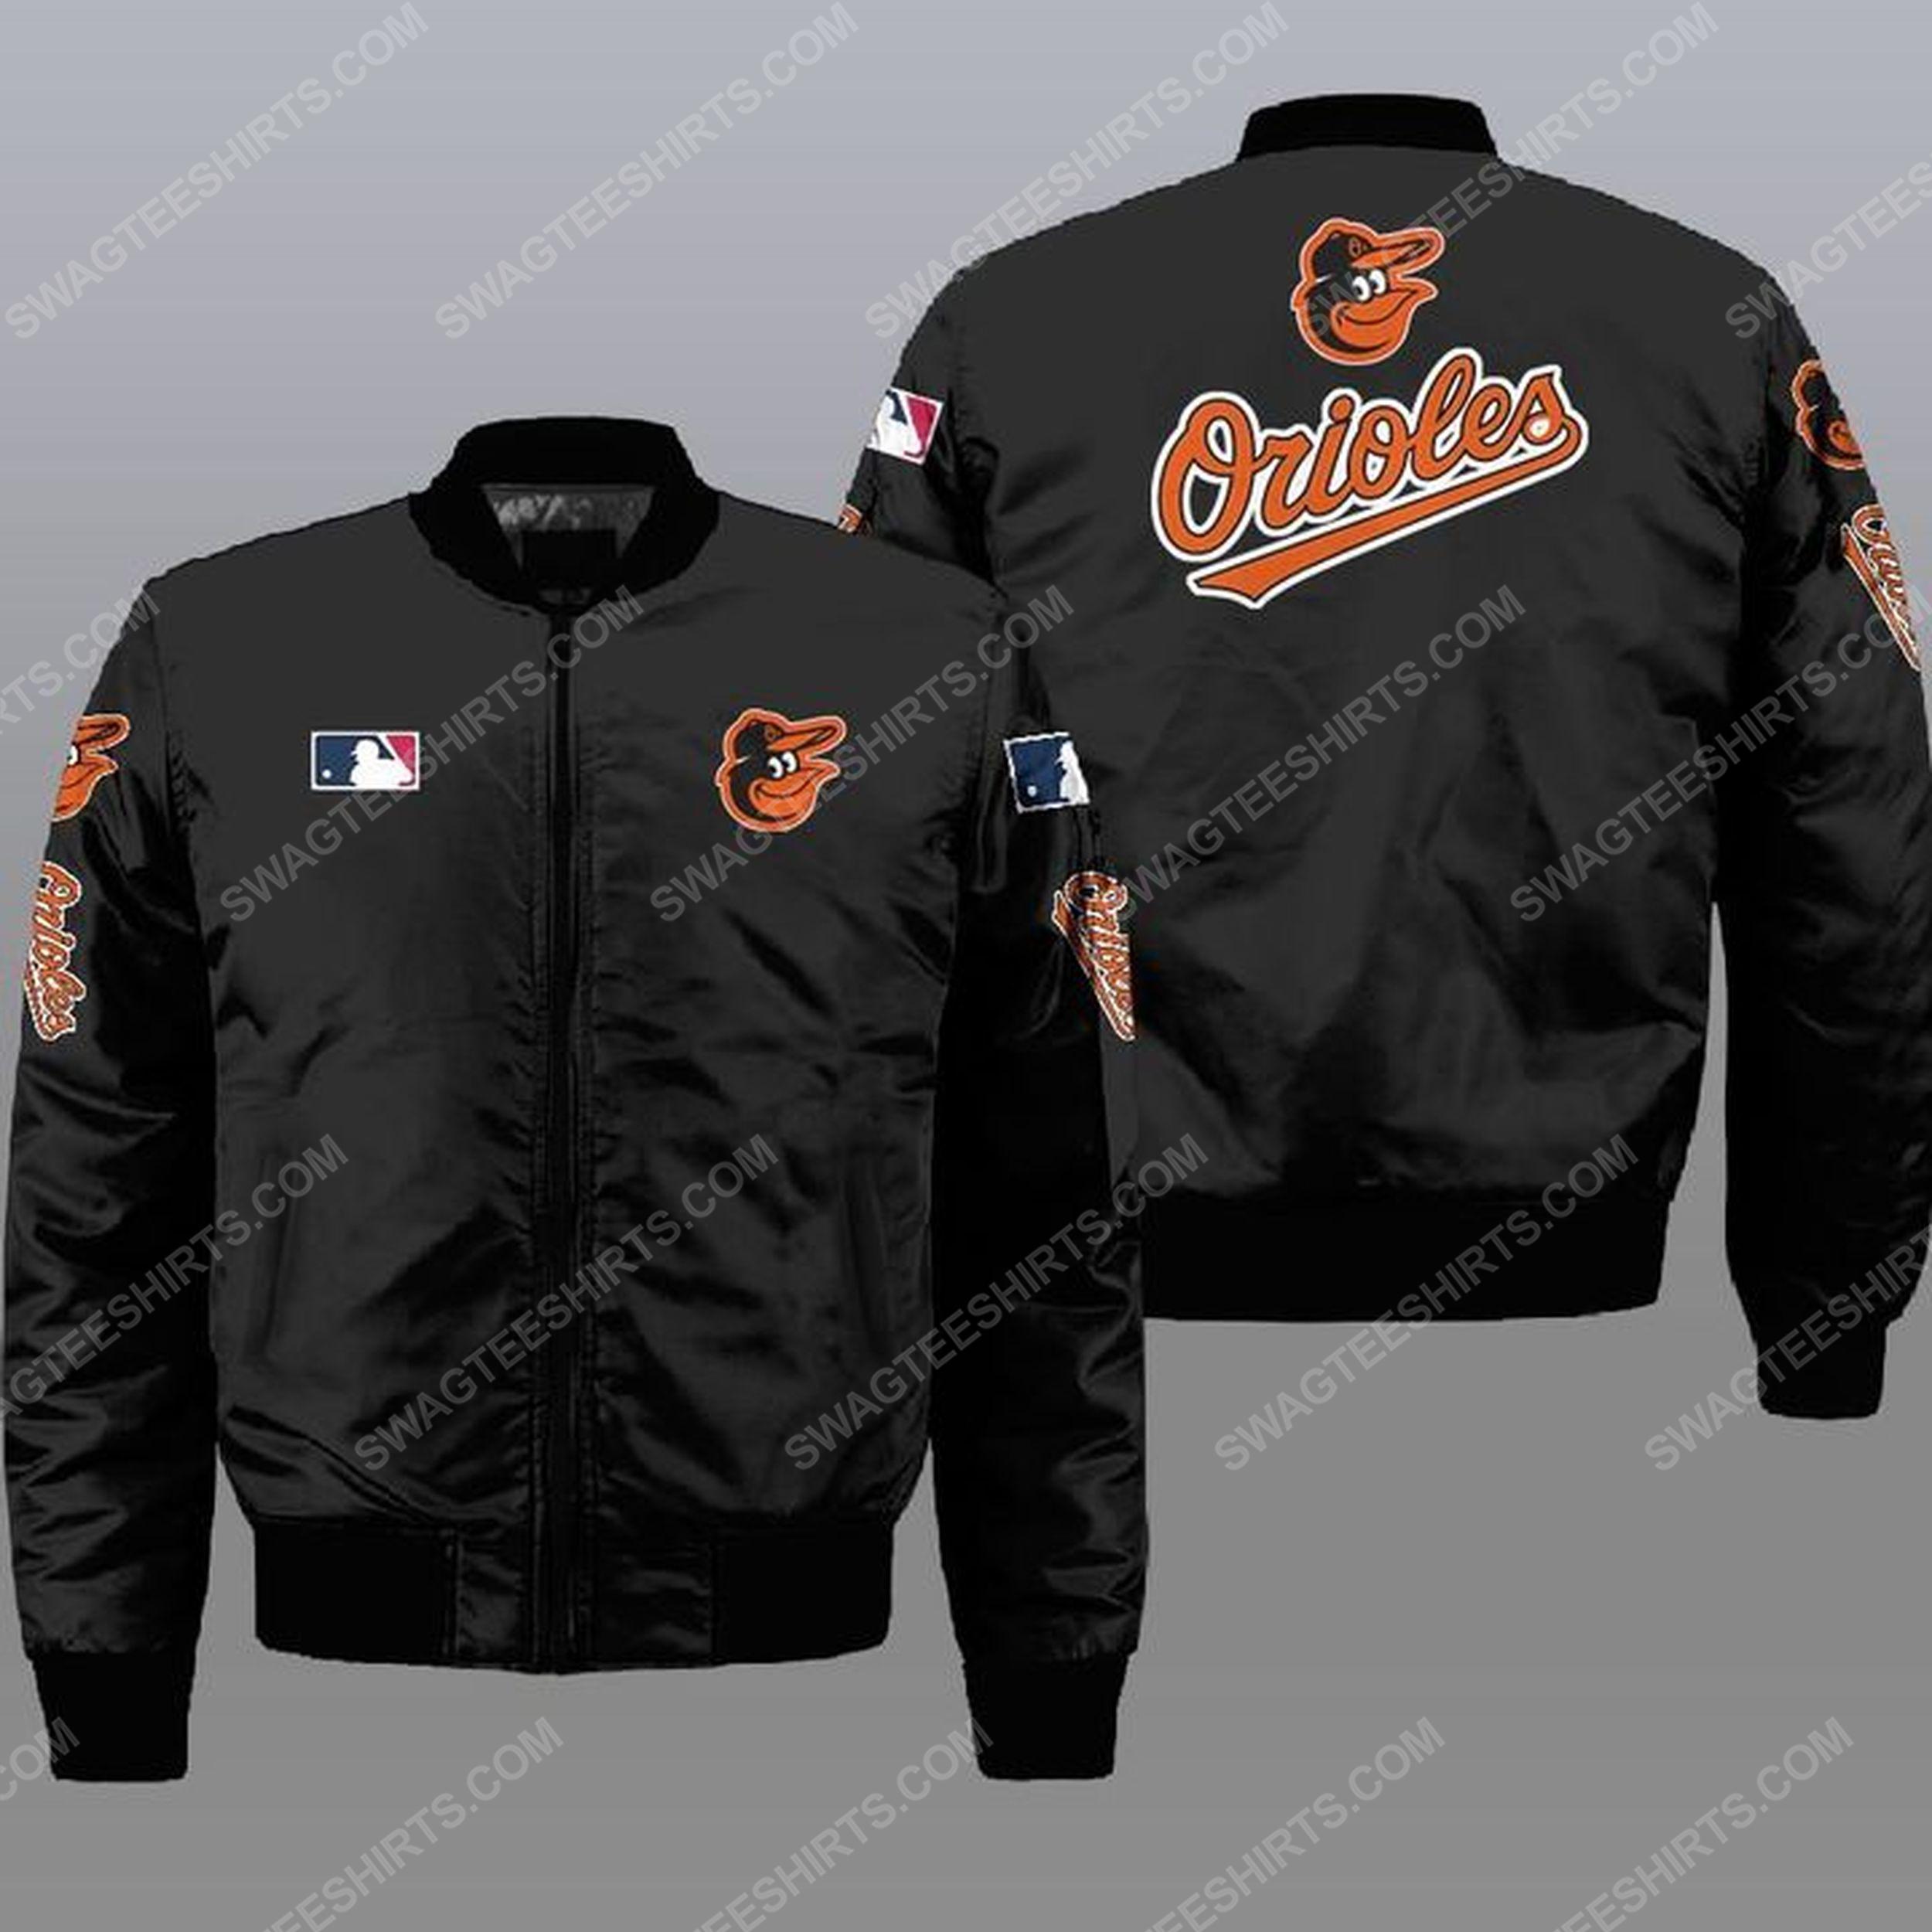 The baltimore orioles mlb all over print bomber jacket - black 1